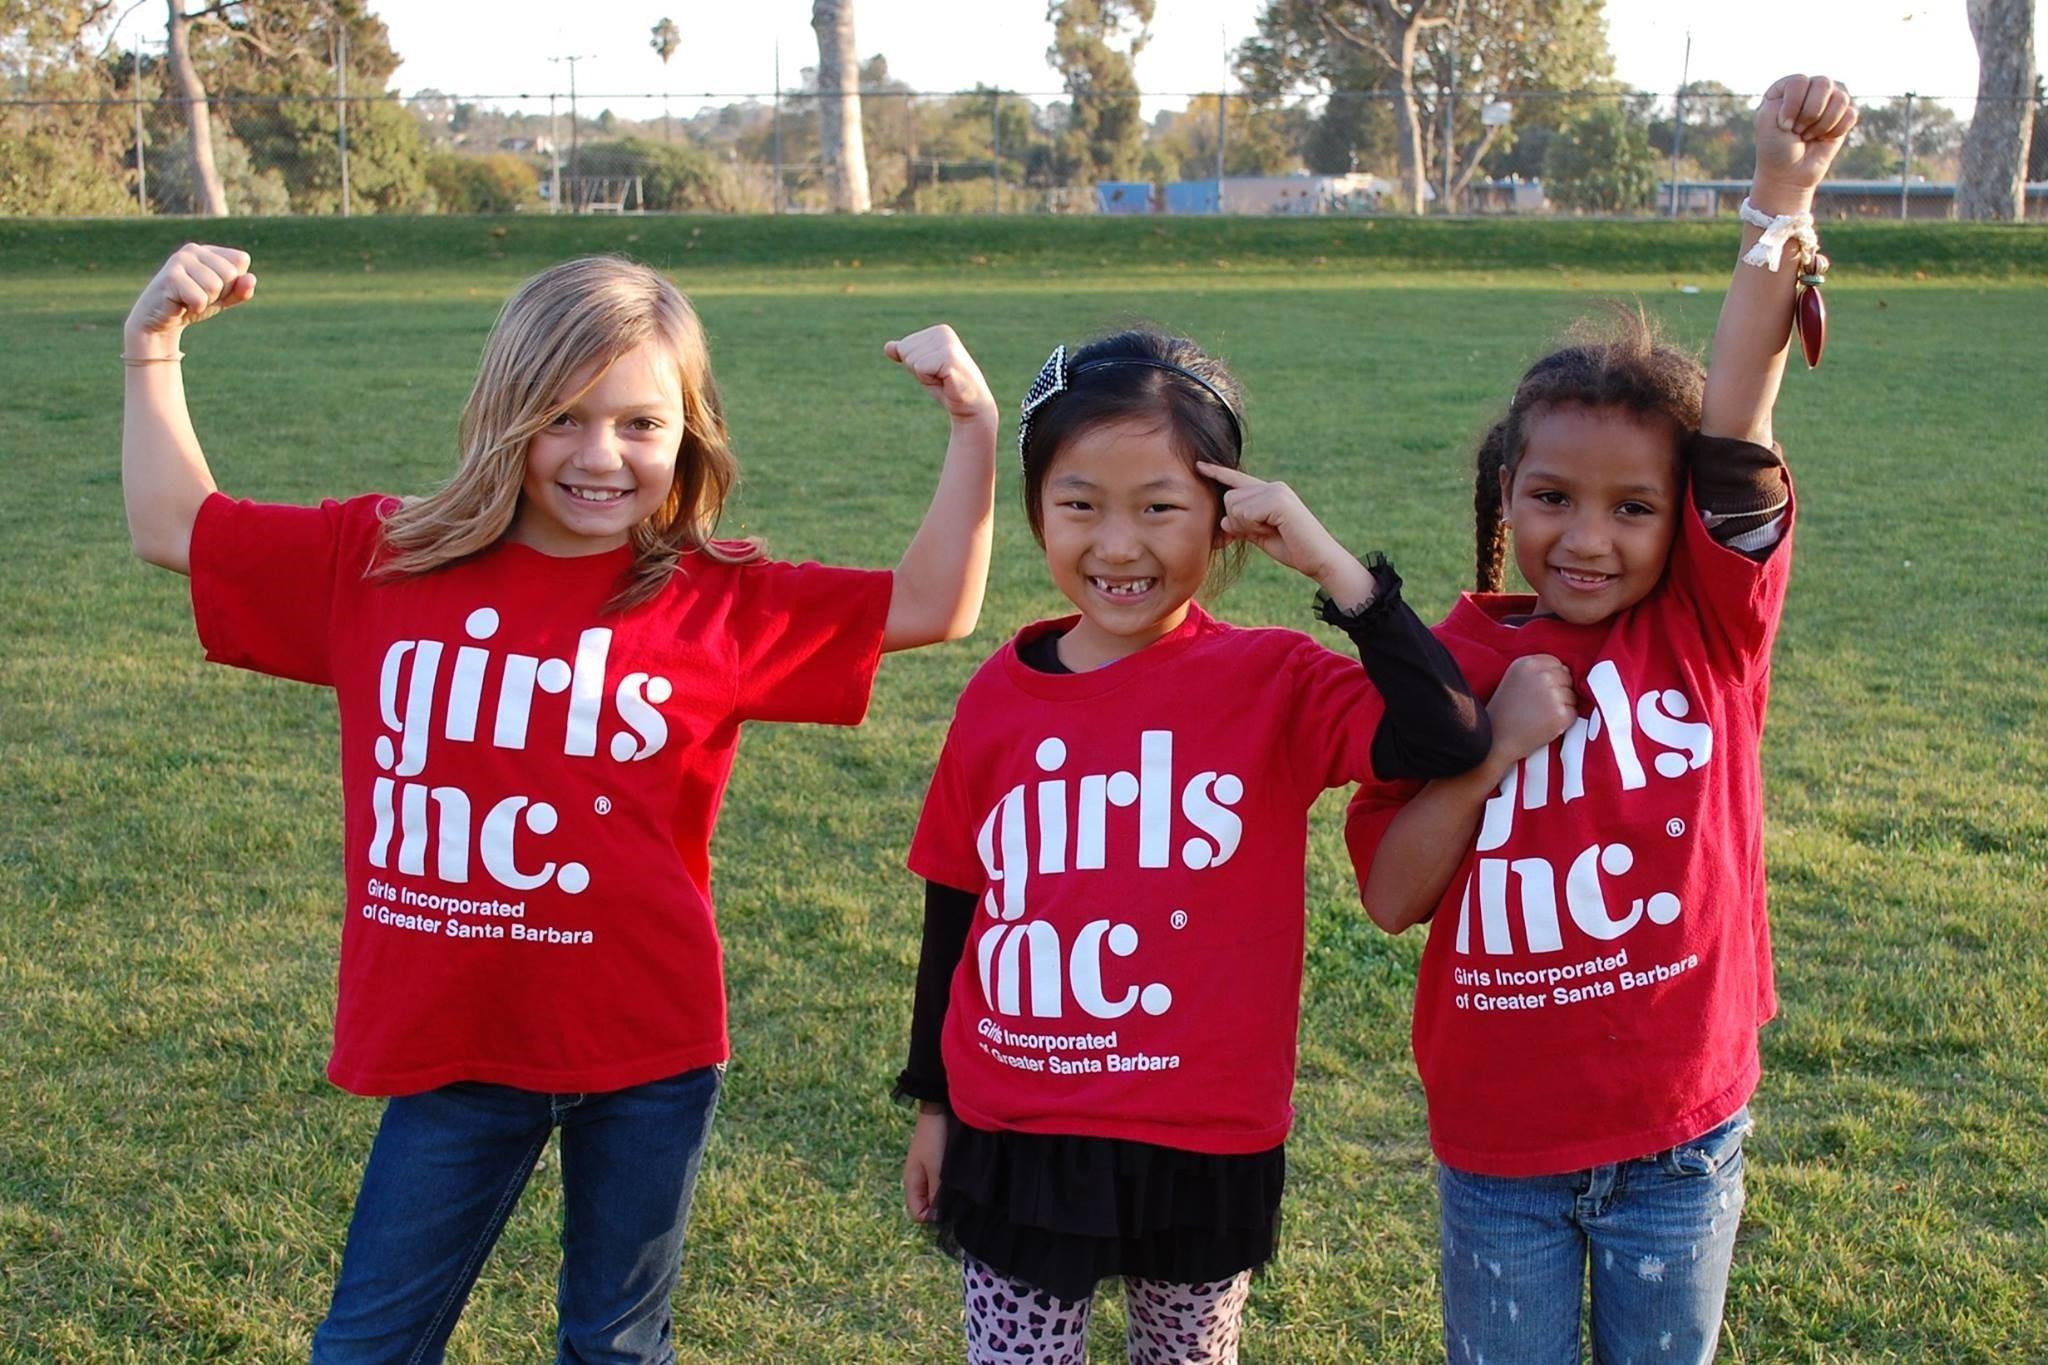 RT @TEAVANA: Thanks to you, nearly $2M was donated to inspiring orgs like @girls_inc. #TeavanaOprahChai http://t.co/WbaJ3DaXPC http://t.co/…